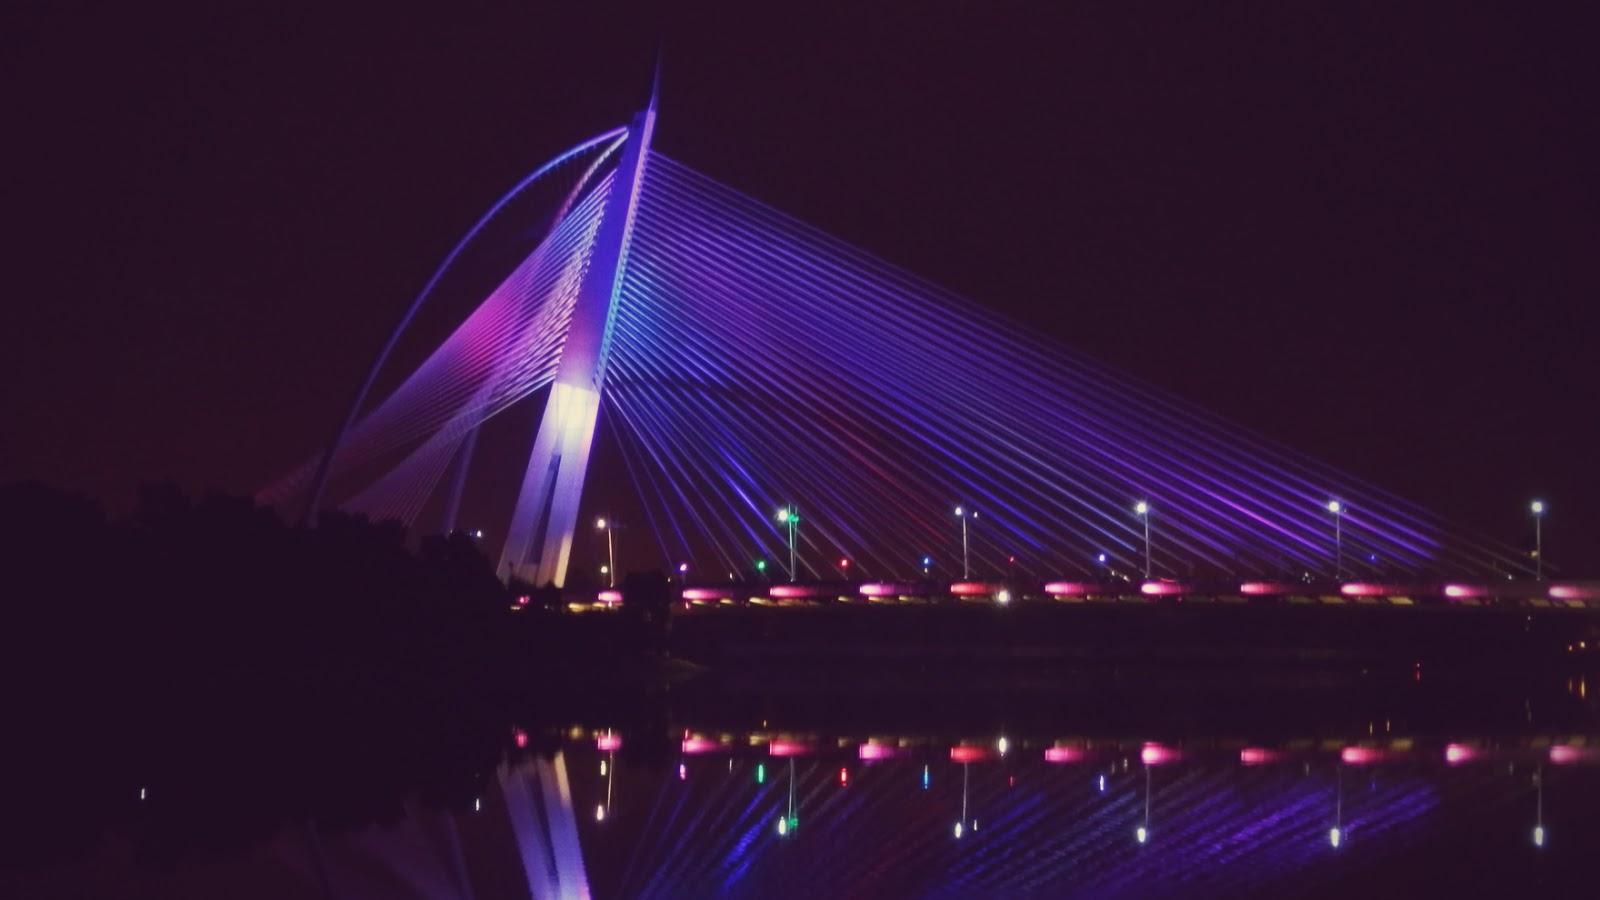 Jambatan Seri Wawasan, Putrajaya